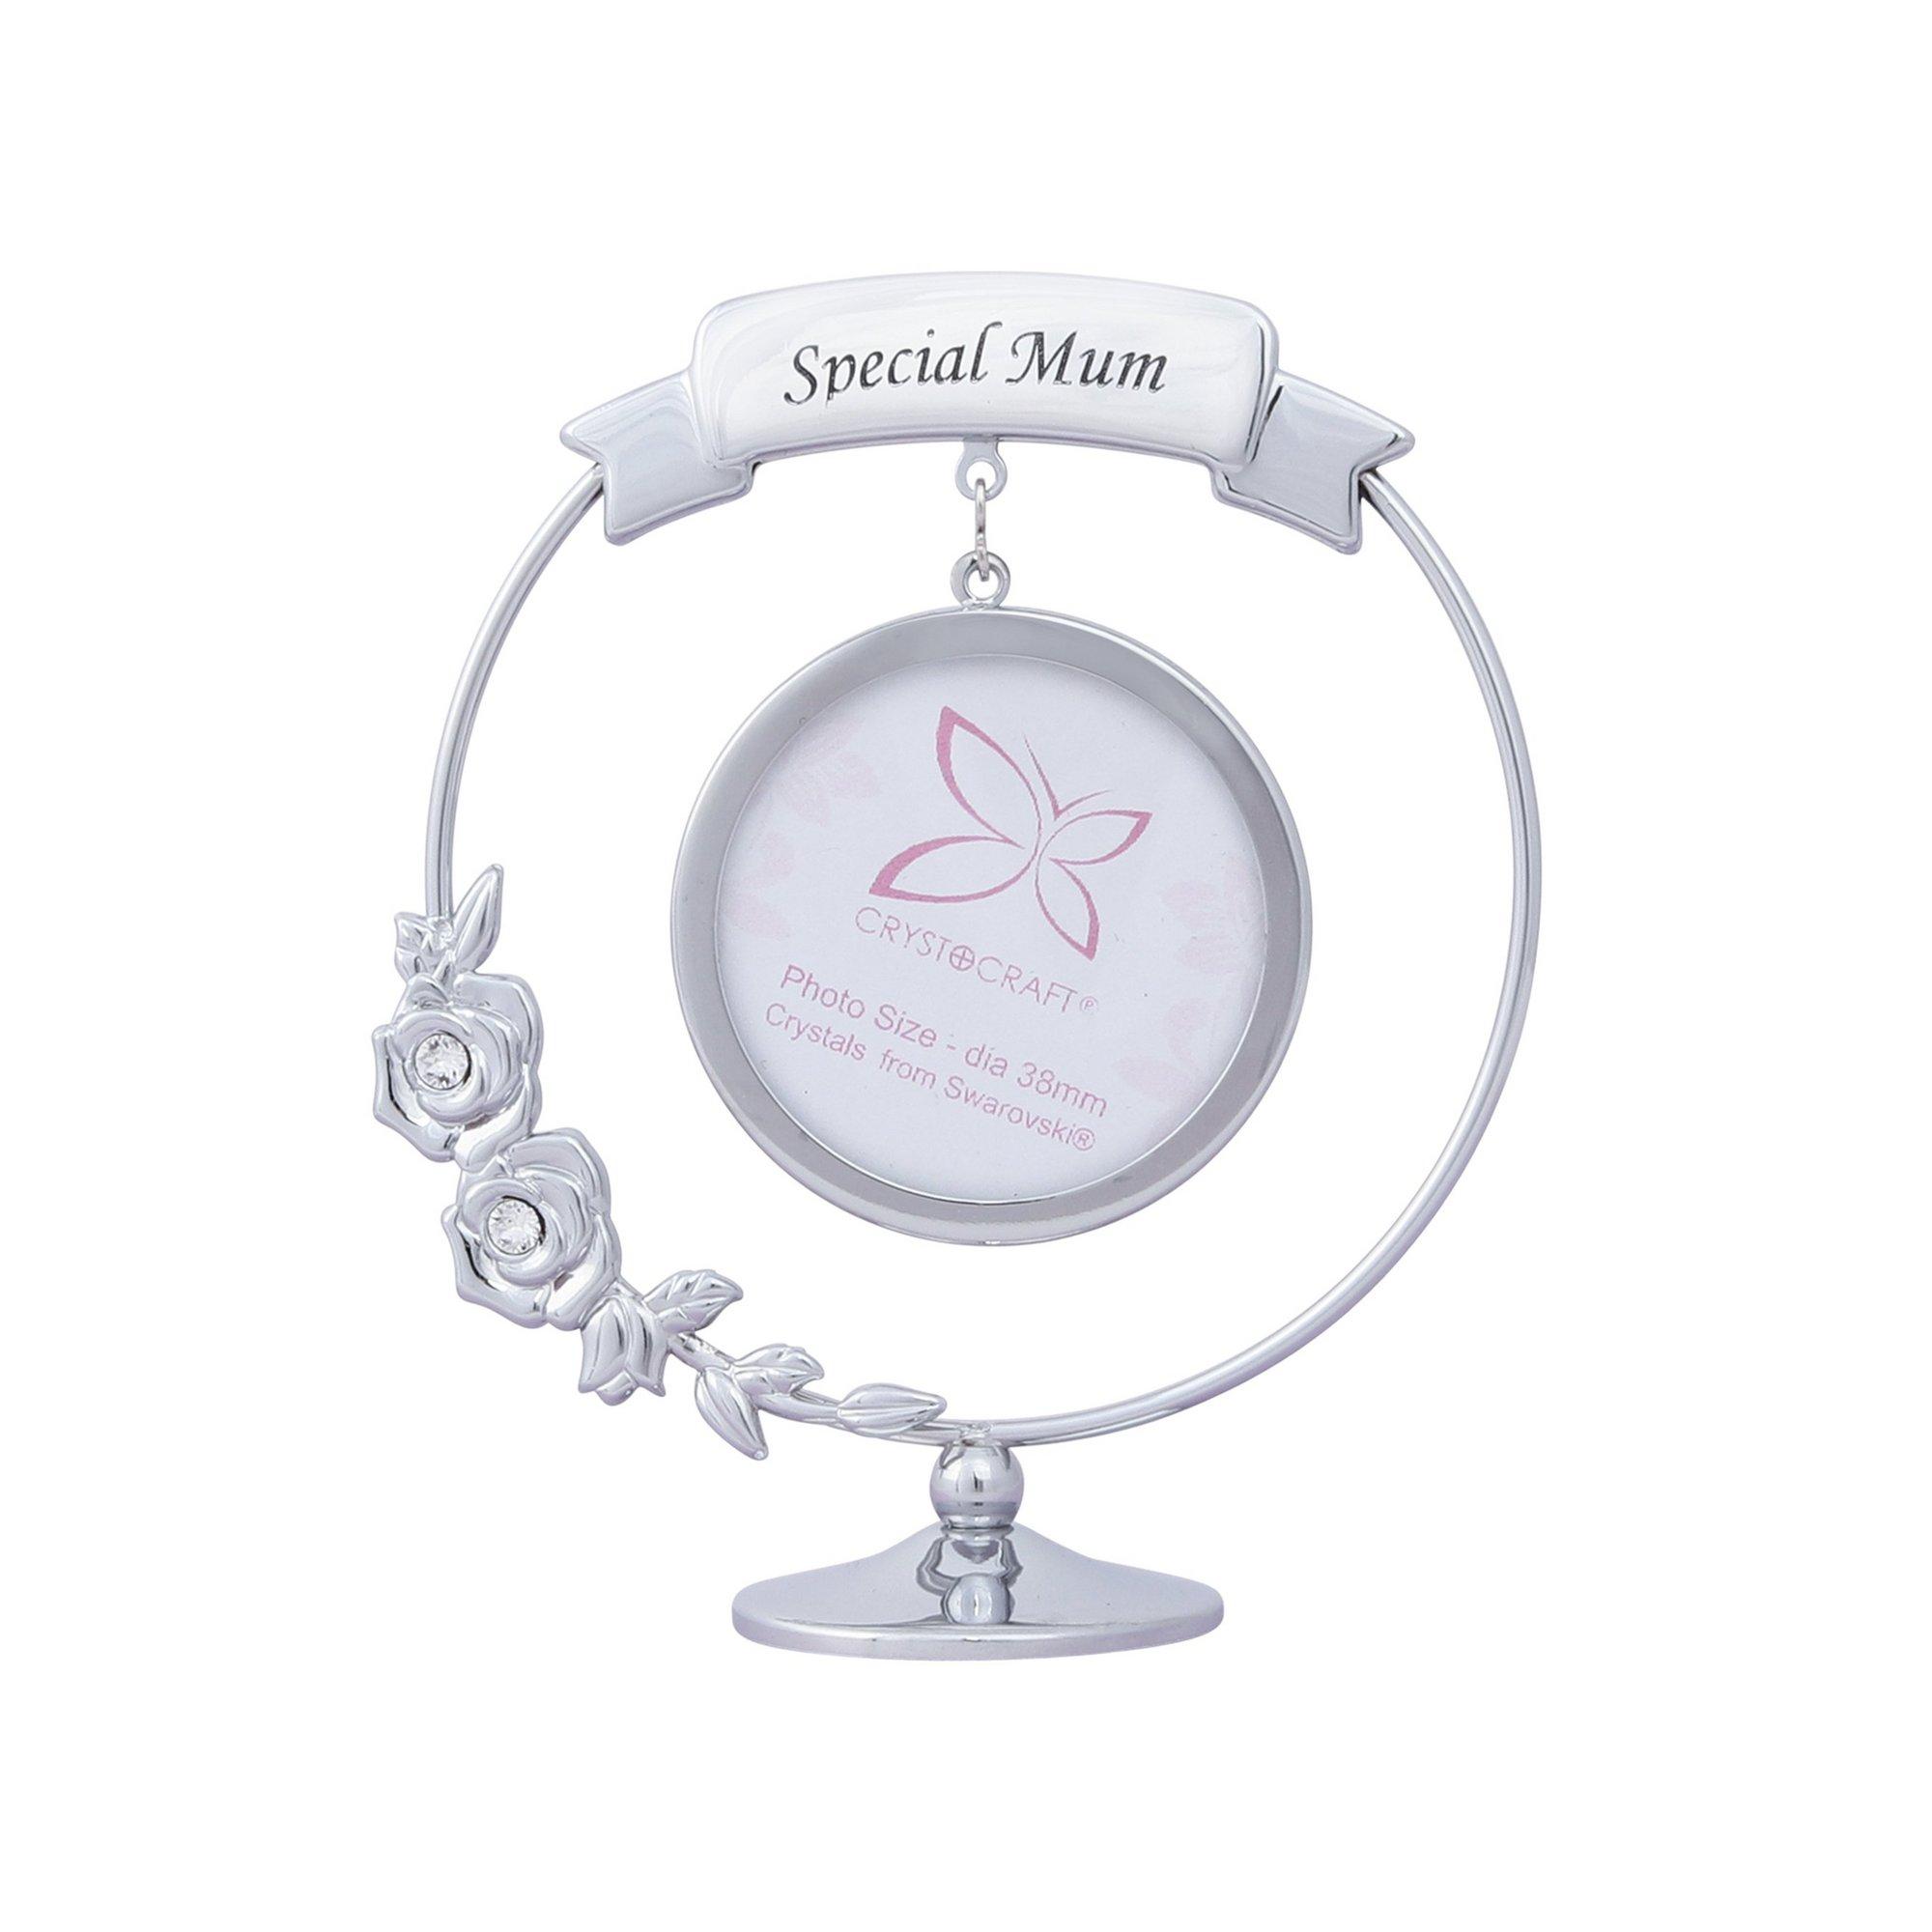 Image of Crystocraft Swarovski elements Special Mum photo Frame